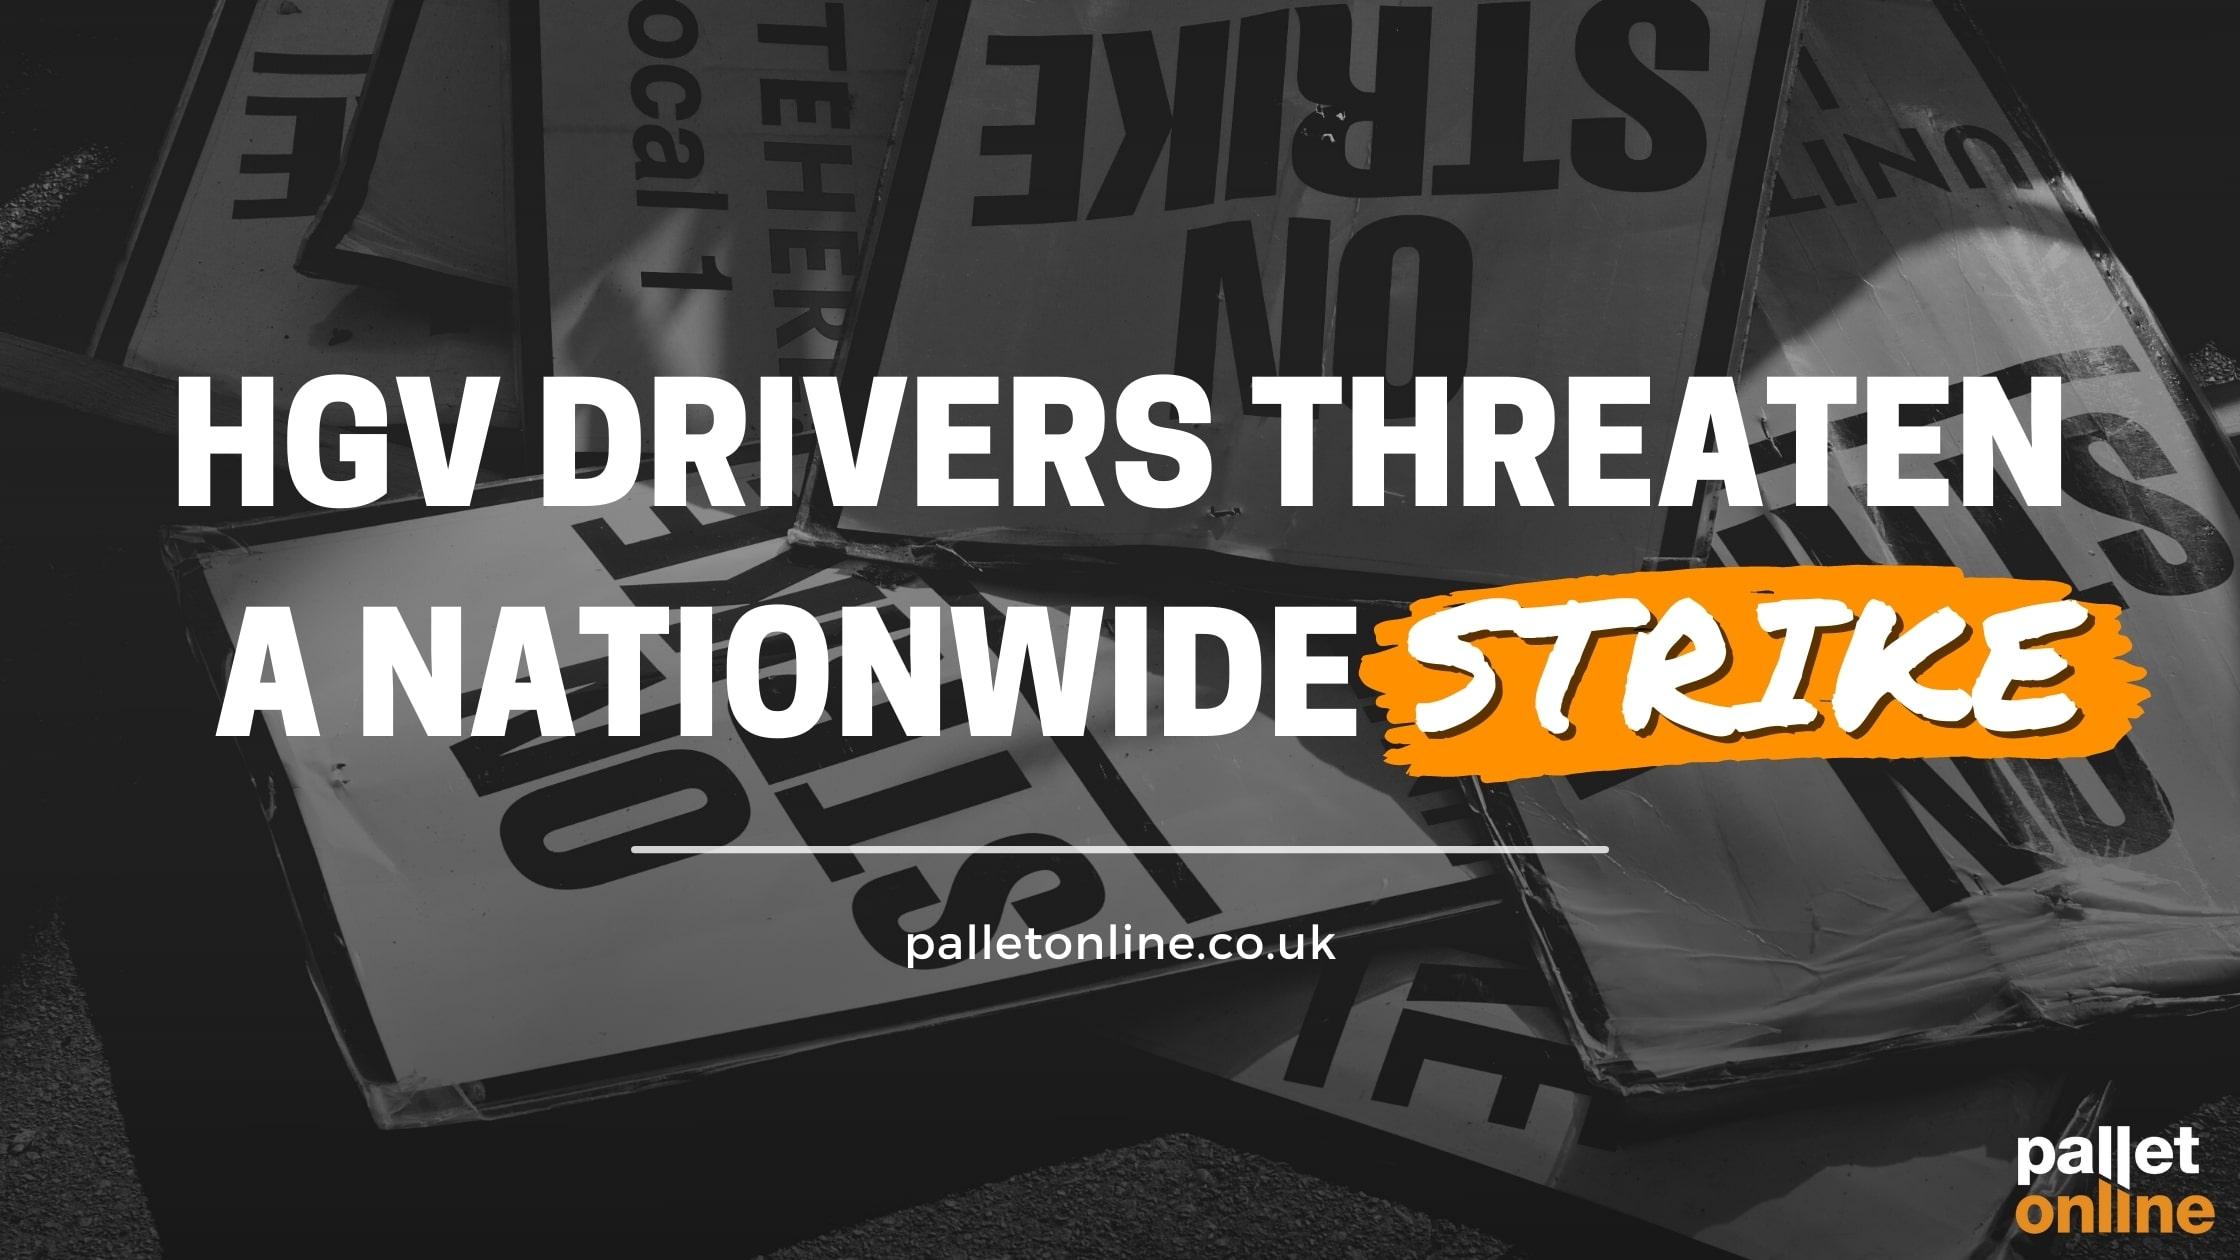 HGV Drivers Threaten A Nationwide Strike